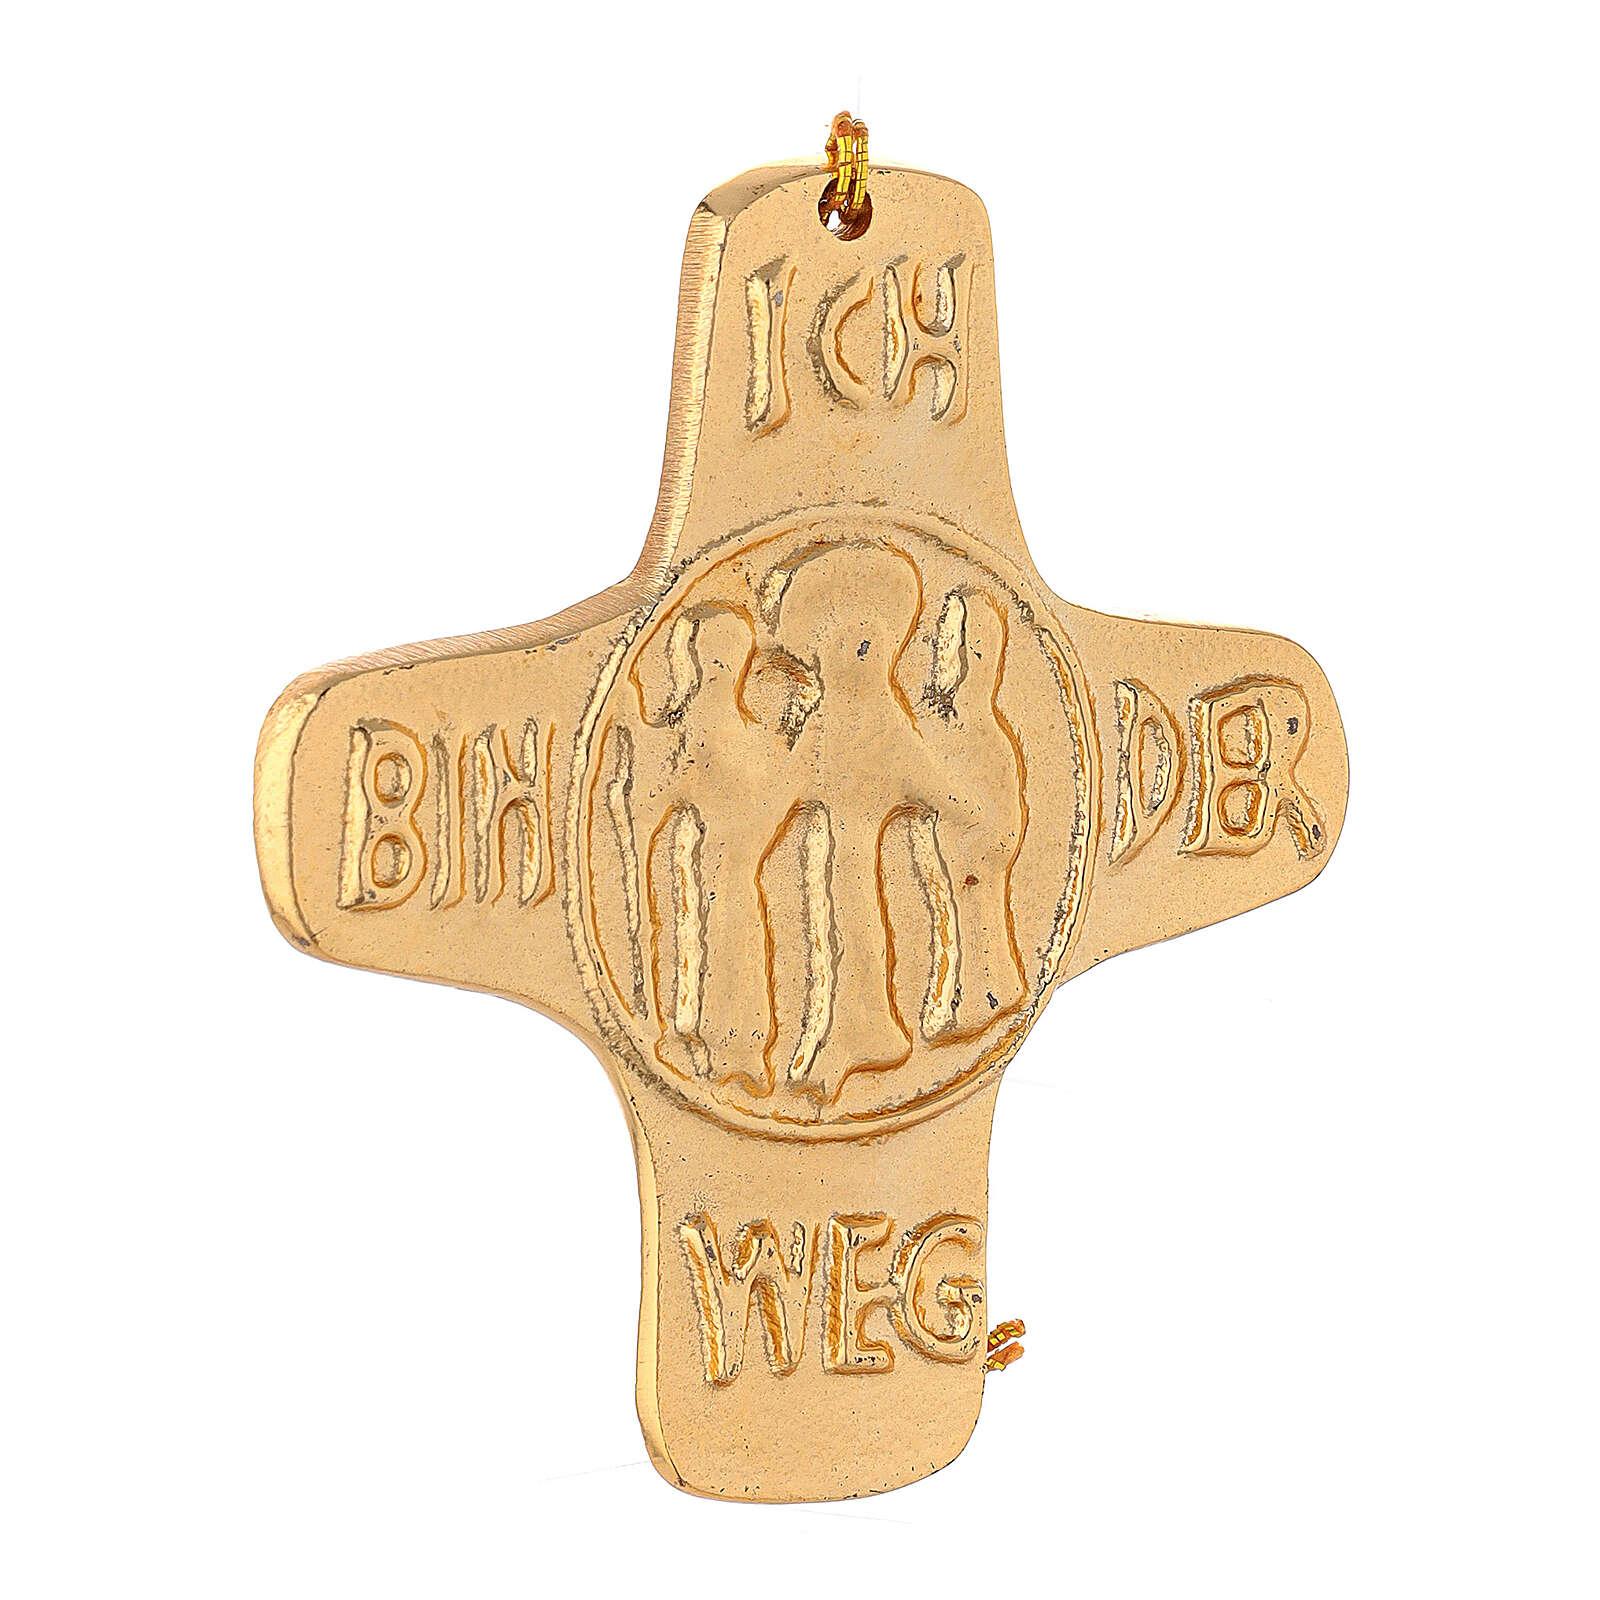 Wall cross I am Life gold plated aluminium 4 1/4 in 4